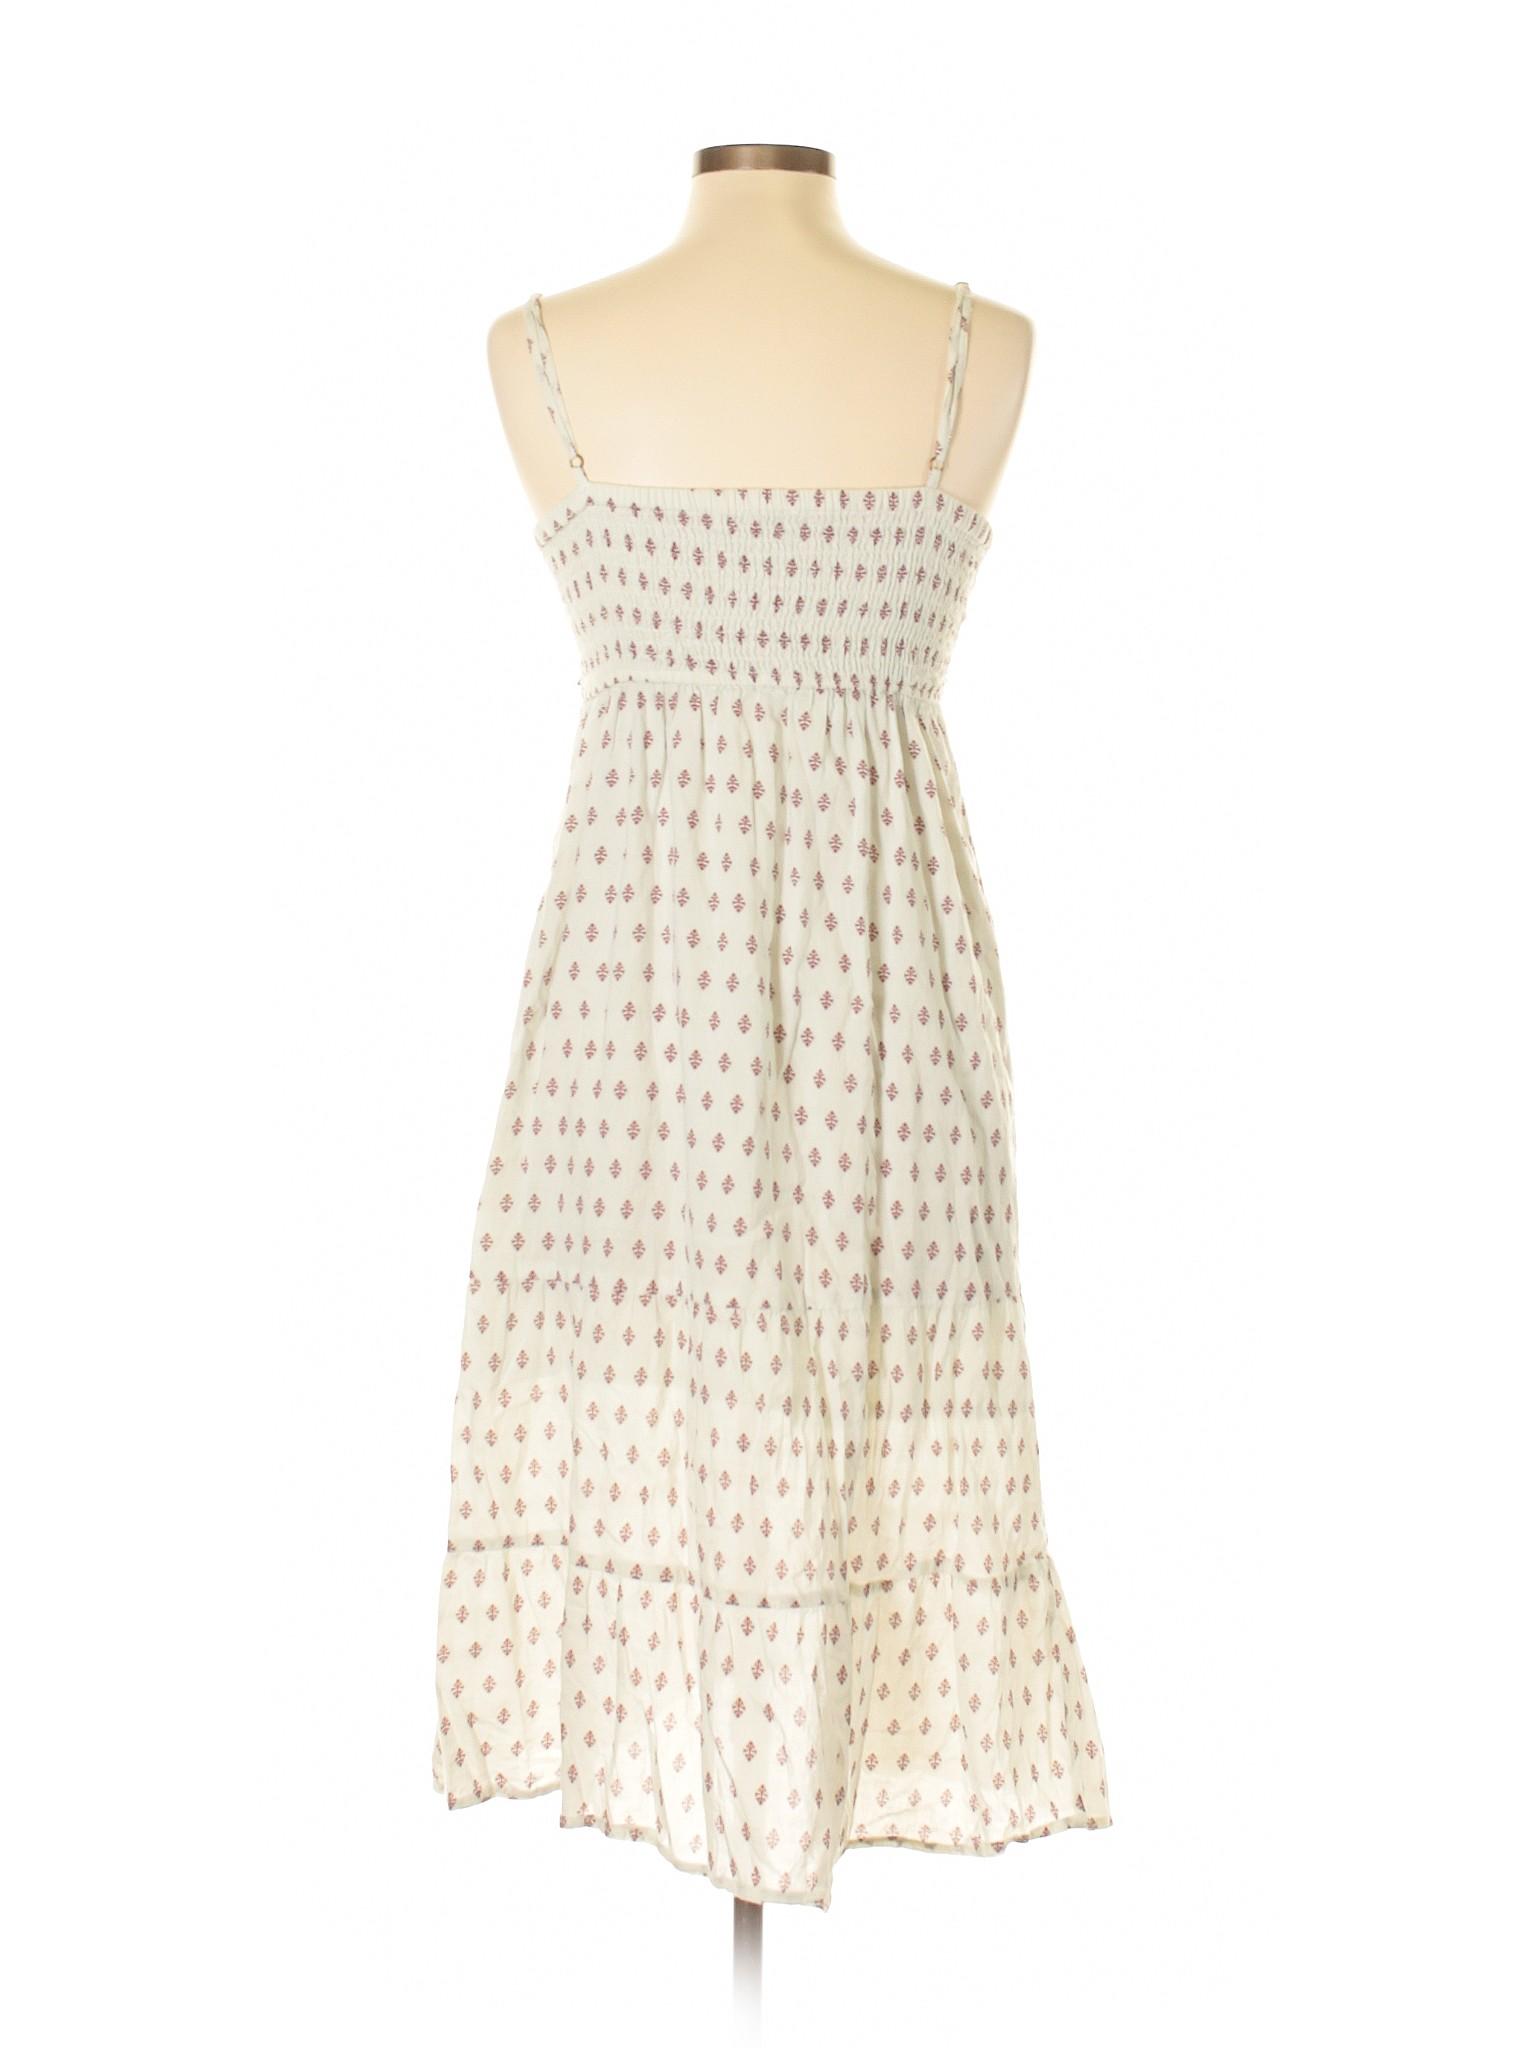 Casual Dress Casual Dress XXI Selling Selling XXI XXI Casual Selling d1Zd7g